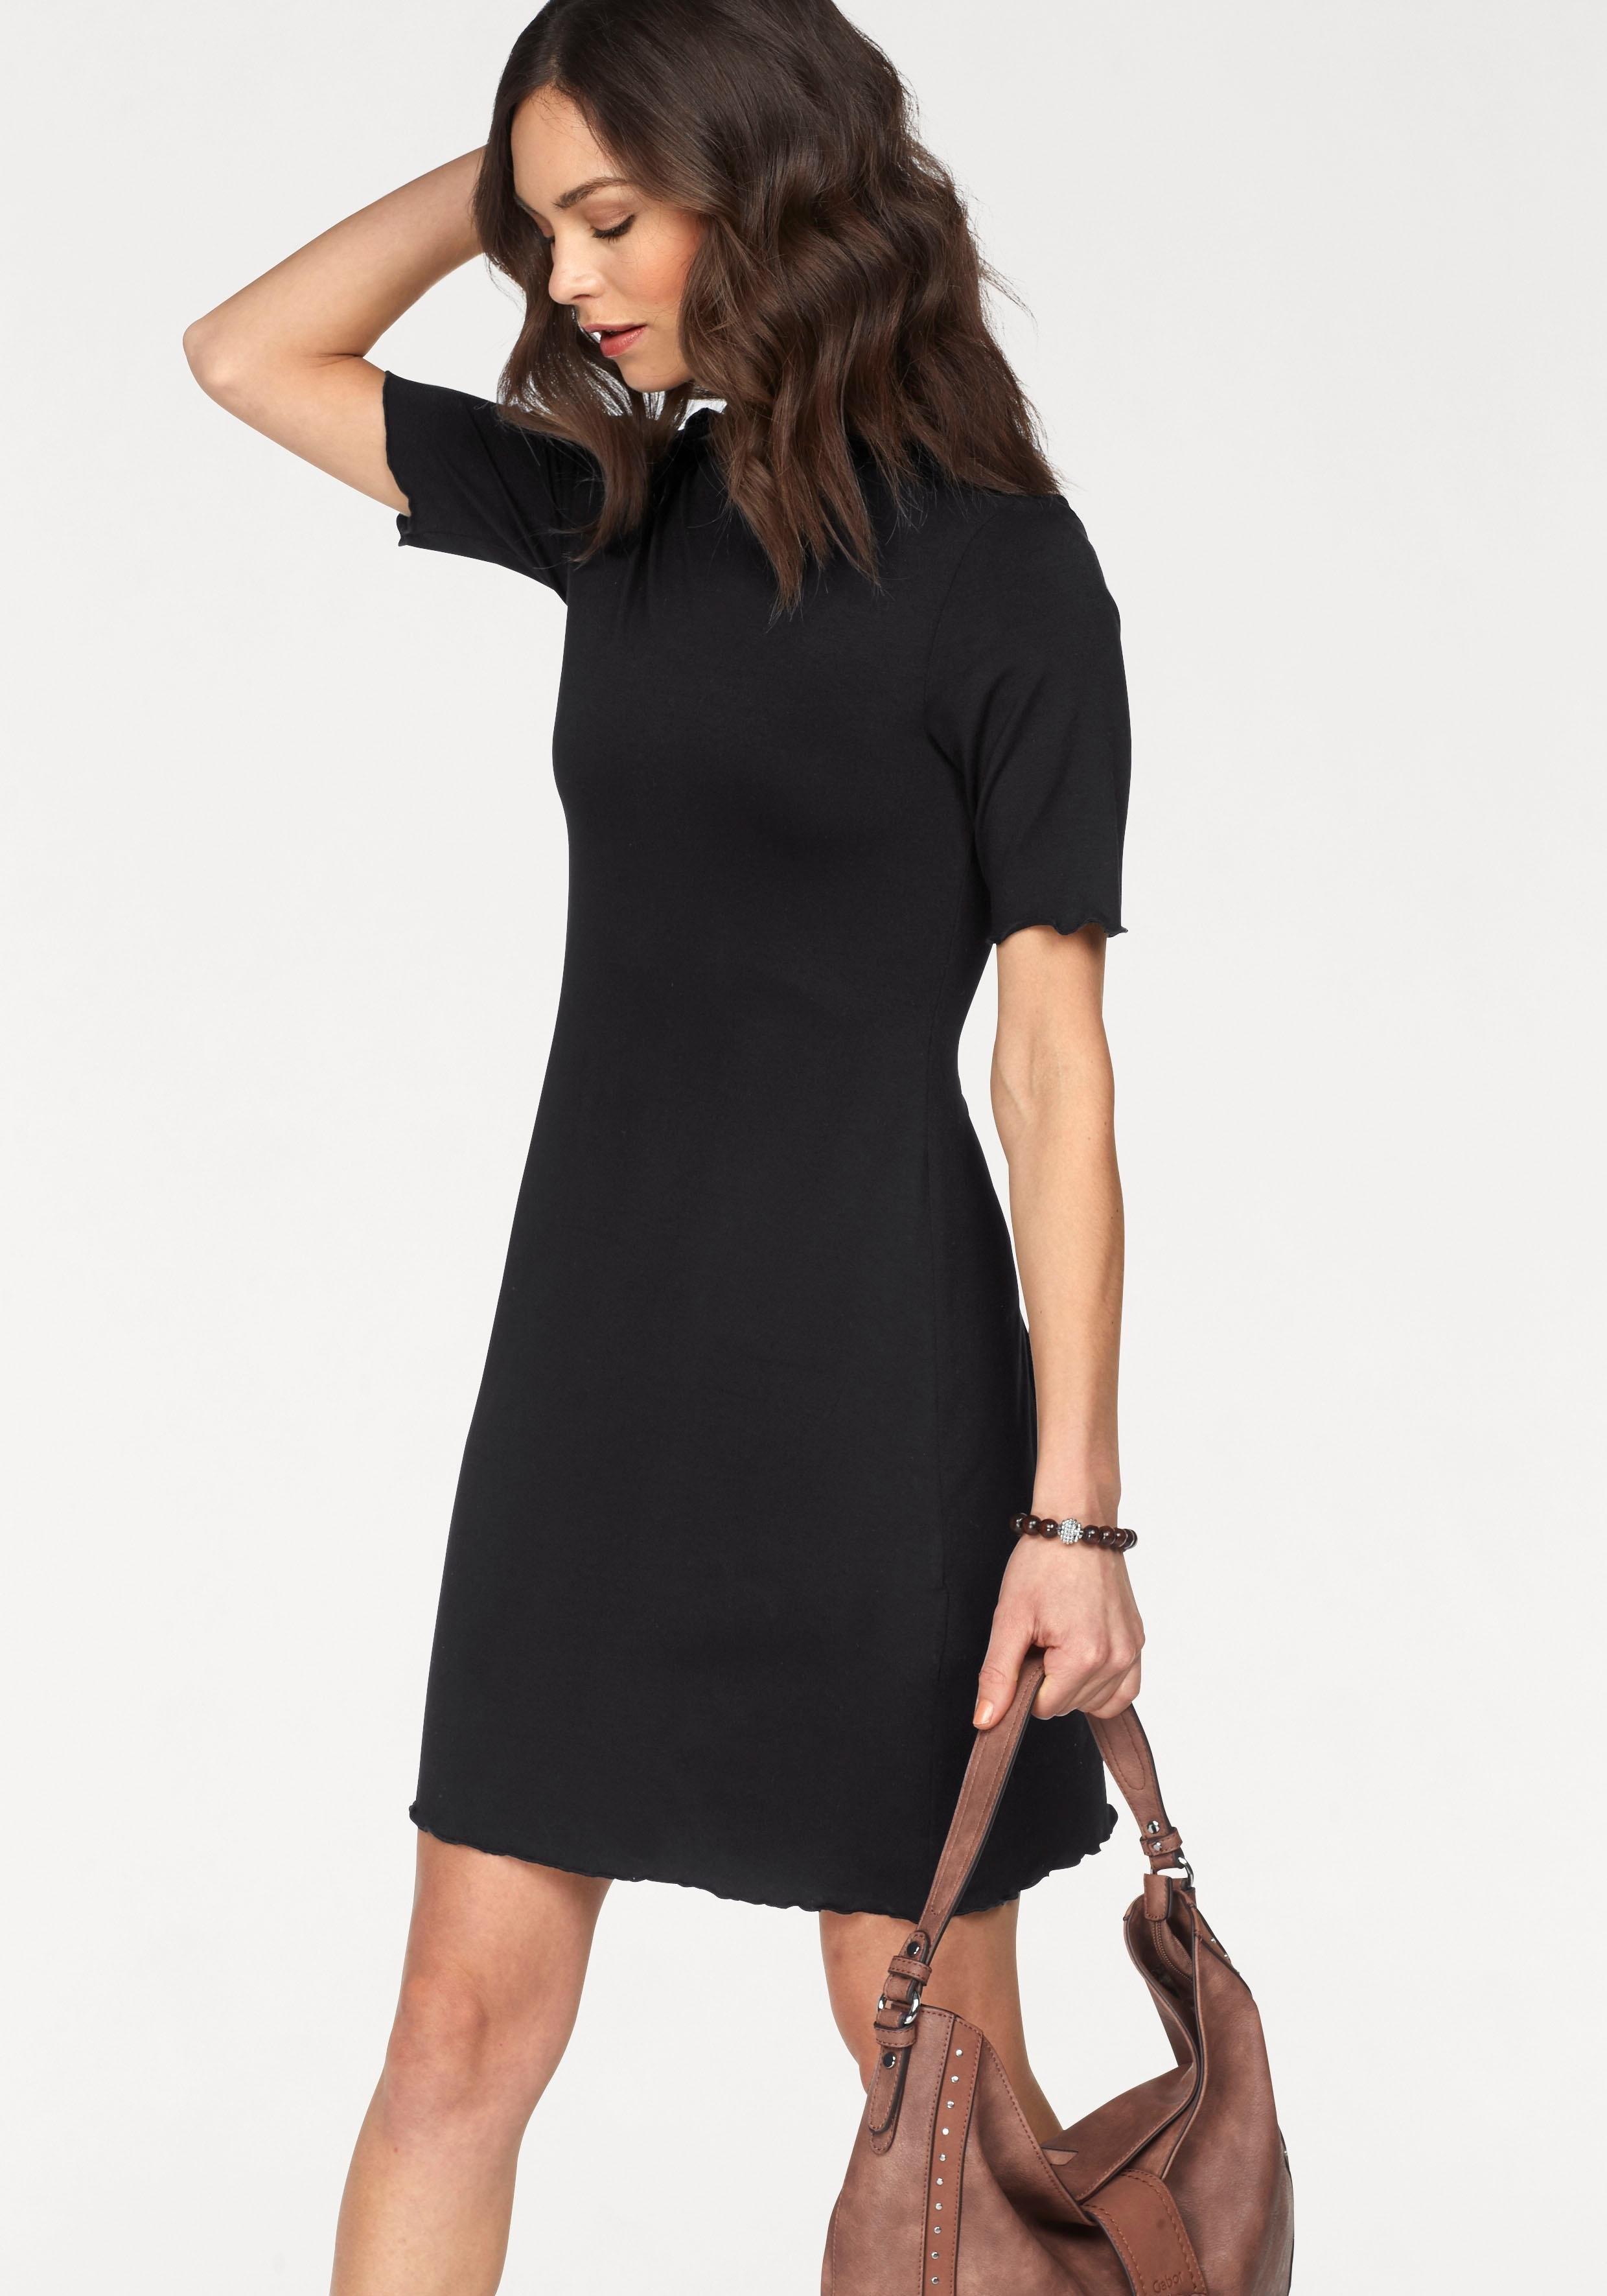 3c09398f70a93e Populair Zwarte jurk kopen  Meer dan 1910 zwarte jurkjes